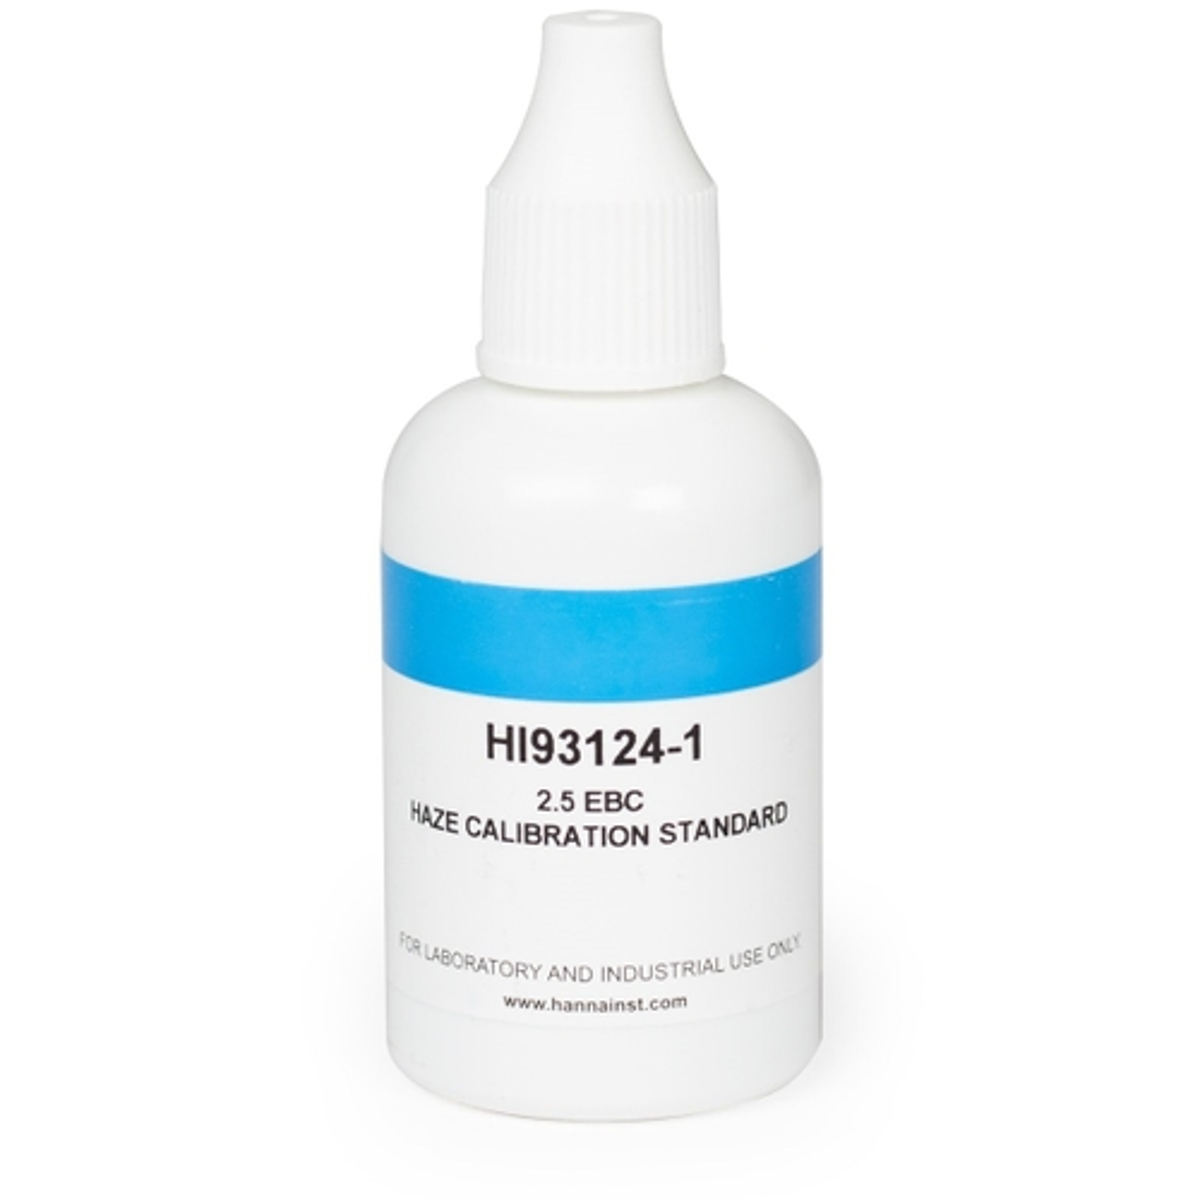 EBC Haze Meter 2.5 EBC Calibration Standard - HI93124-1